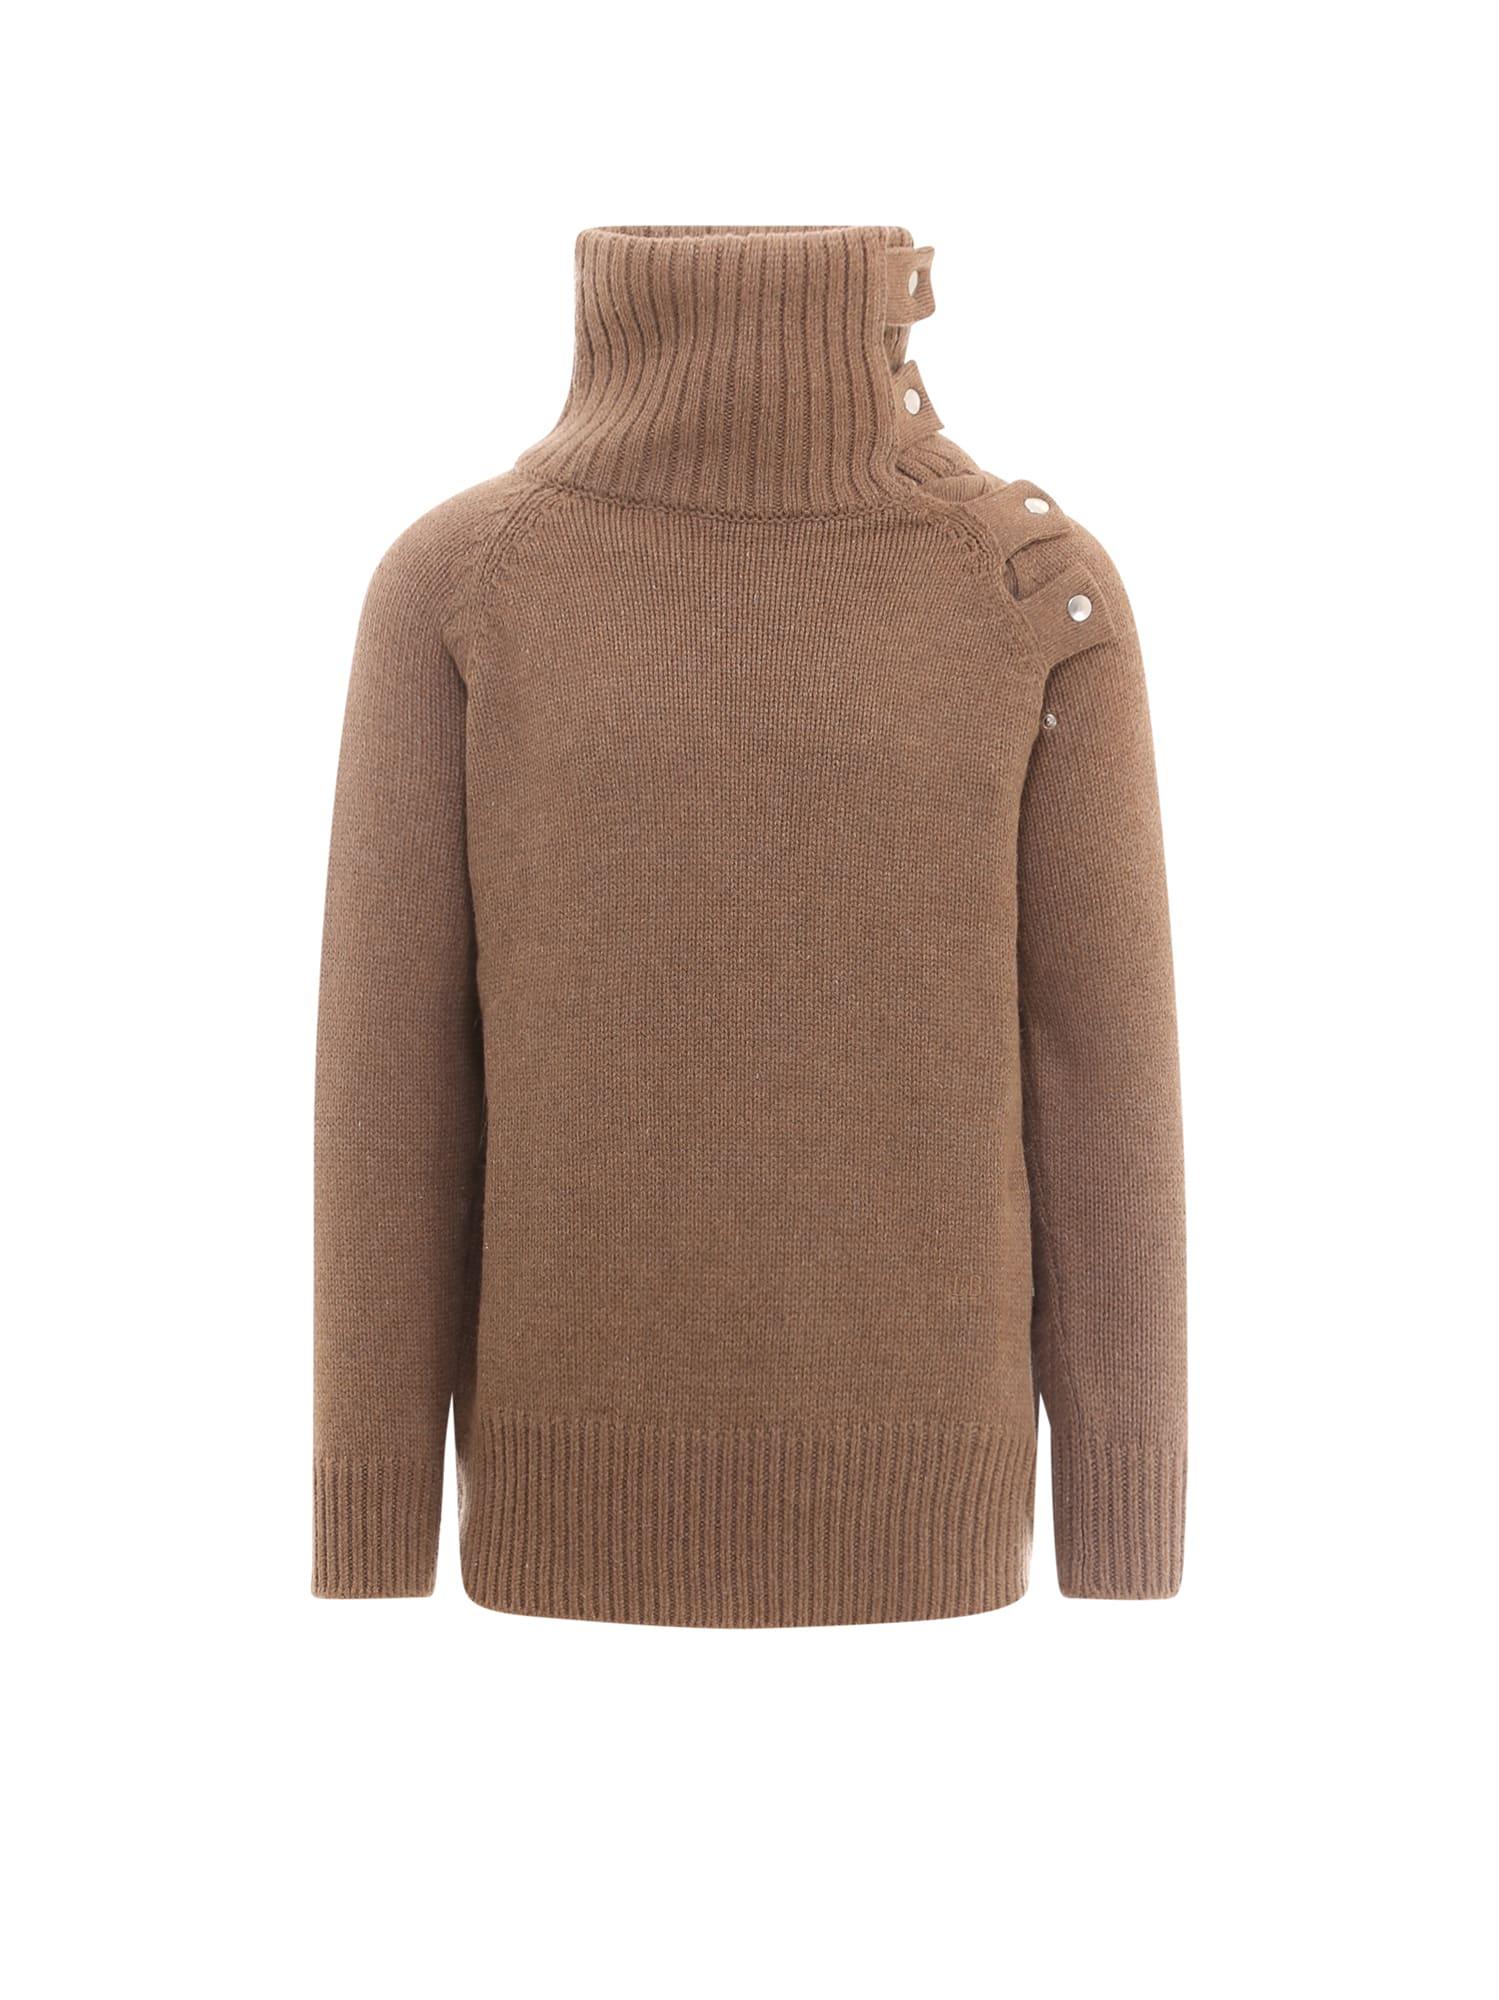 Laurence Bras Sweater